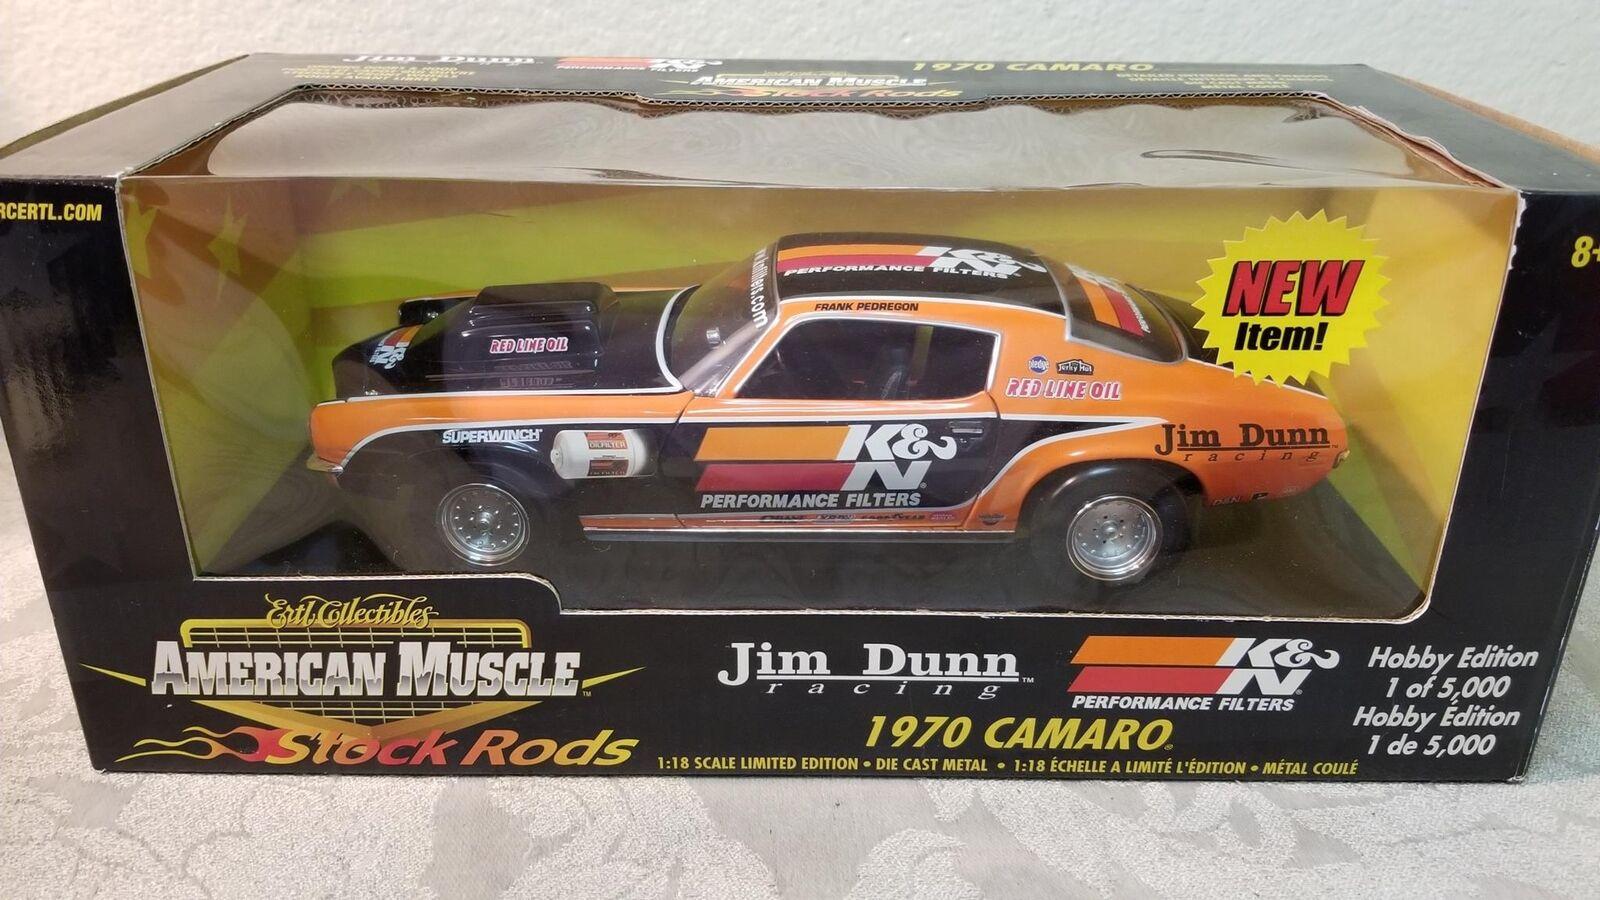 barato American Muscle Jim Jim Jim Dunn 1970 Camaro 1 18 Ltd Edt. Menta en caja  hasta un 60% de descuento